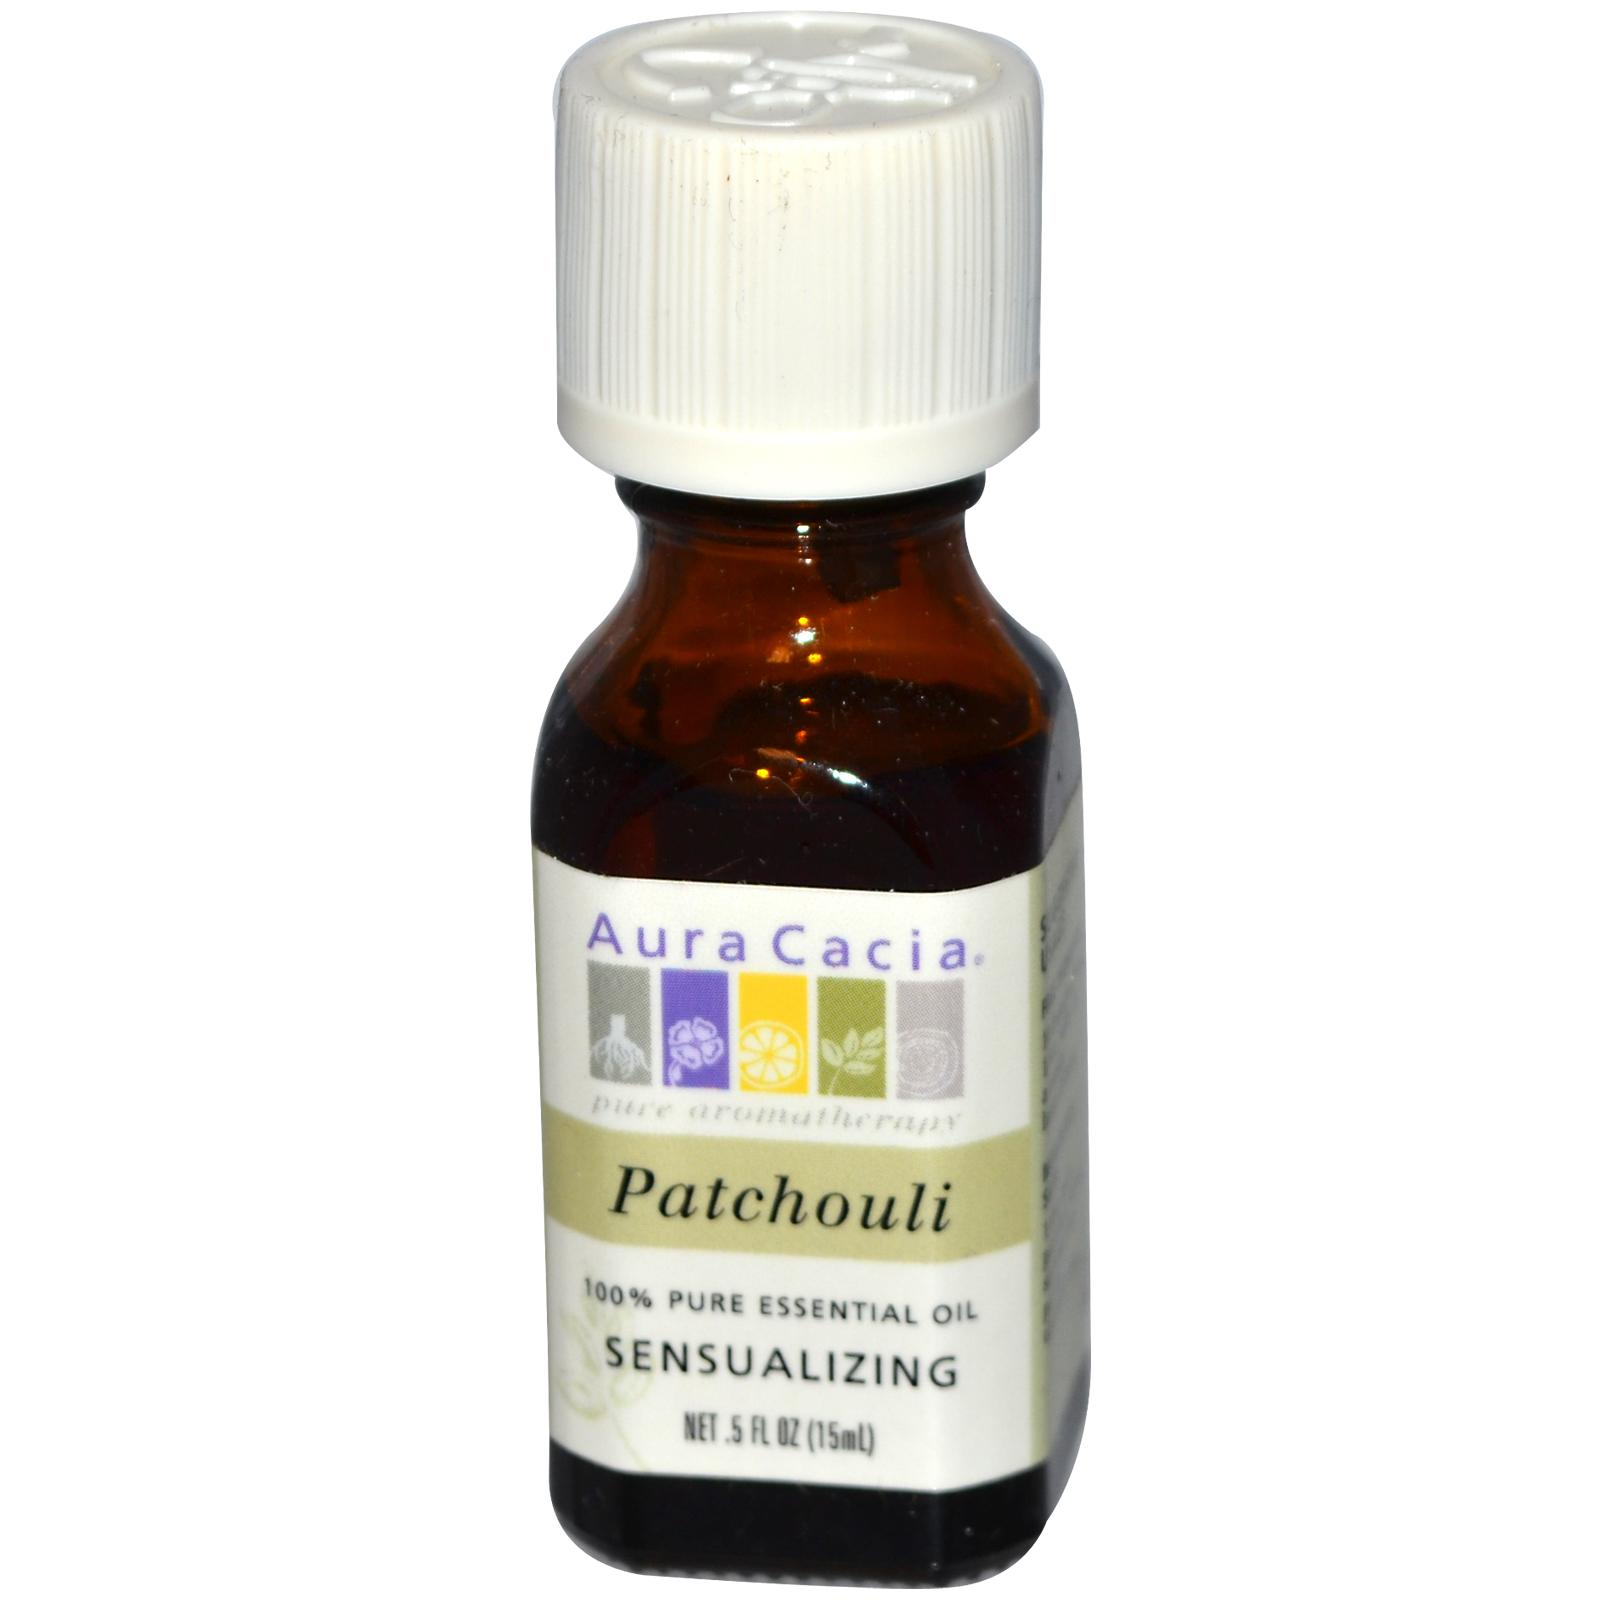 Aura Cacia Patchouli Essential Oil (1x0.5Oz)